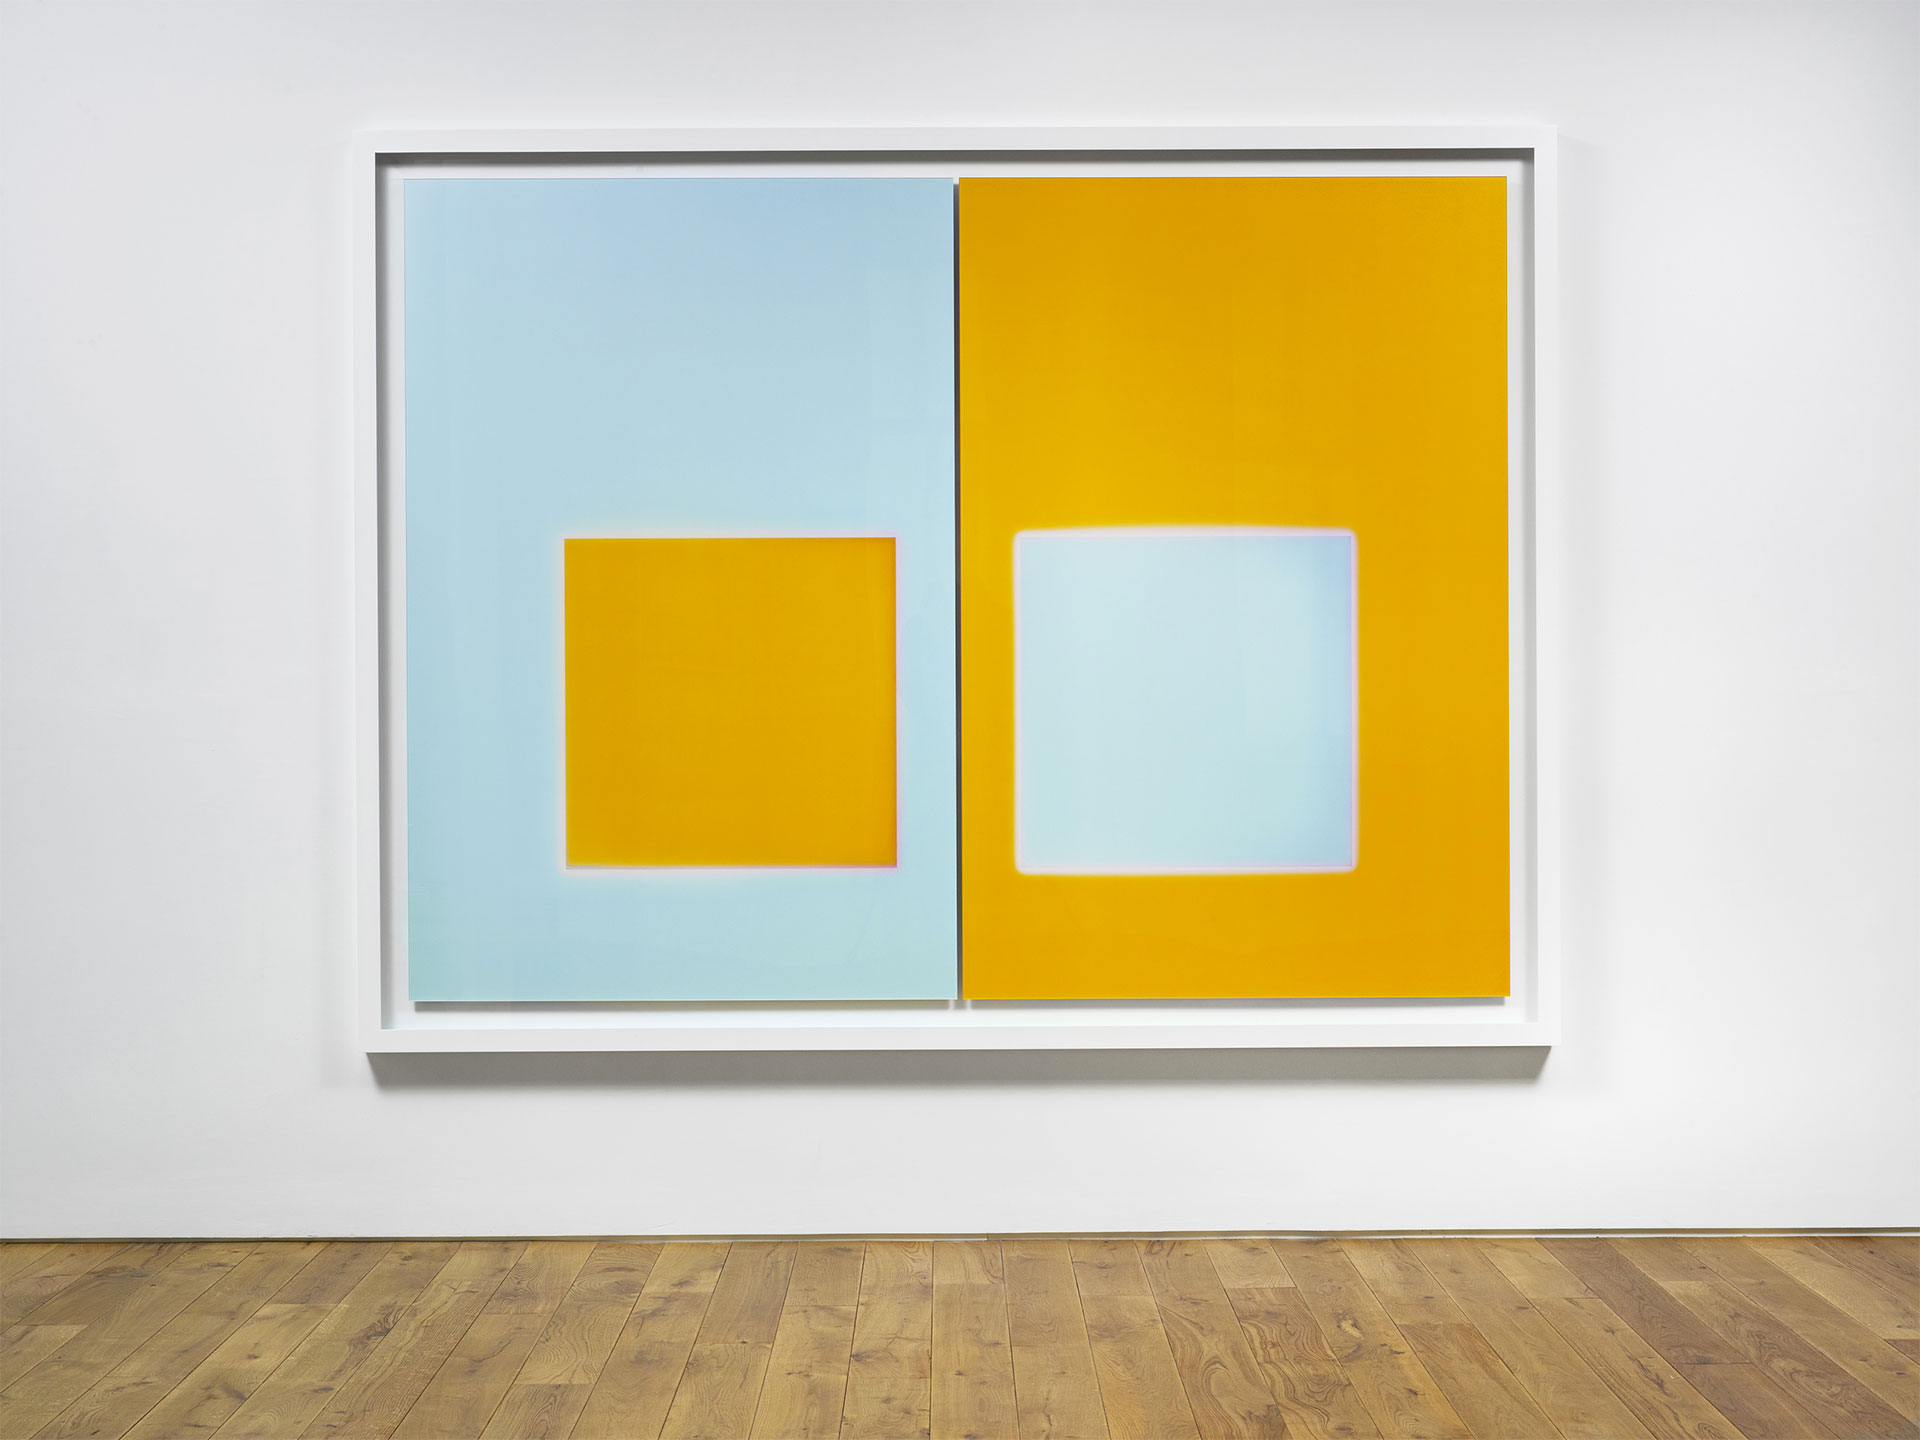 02_Galerie-Gimpel-et-Muller